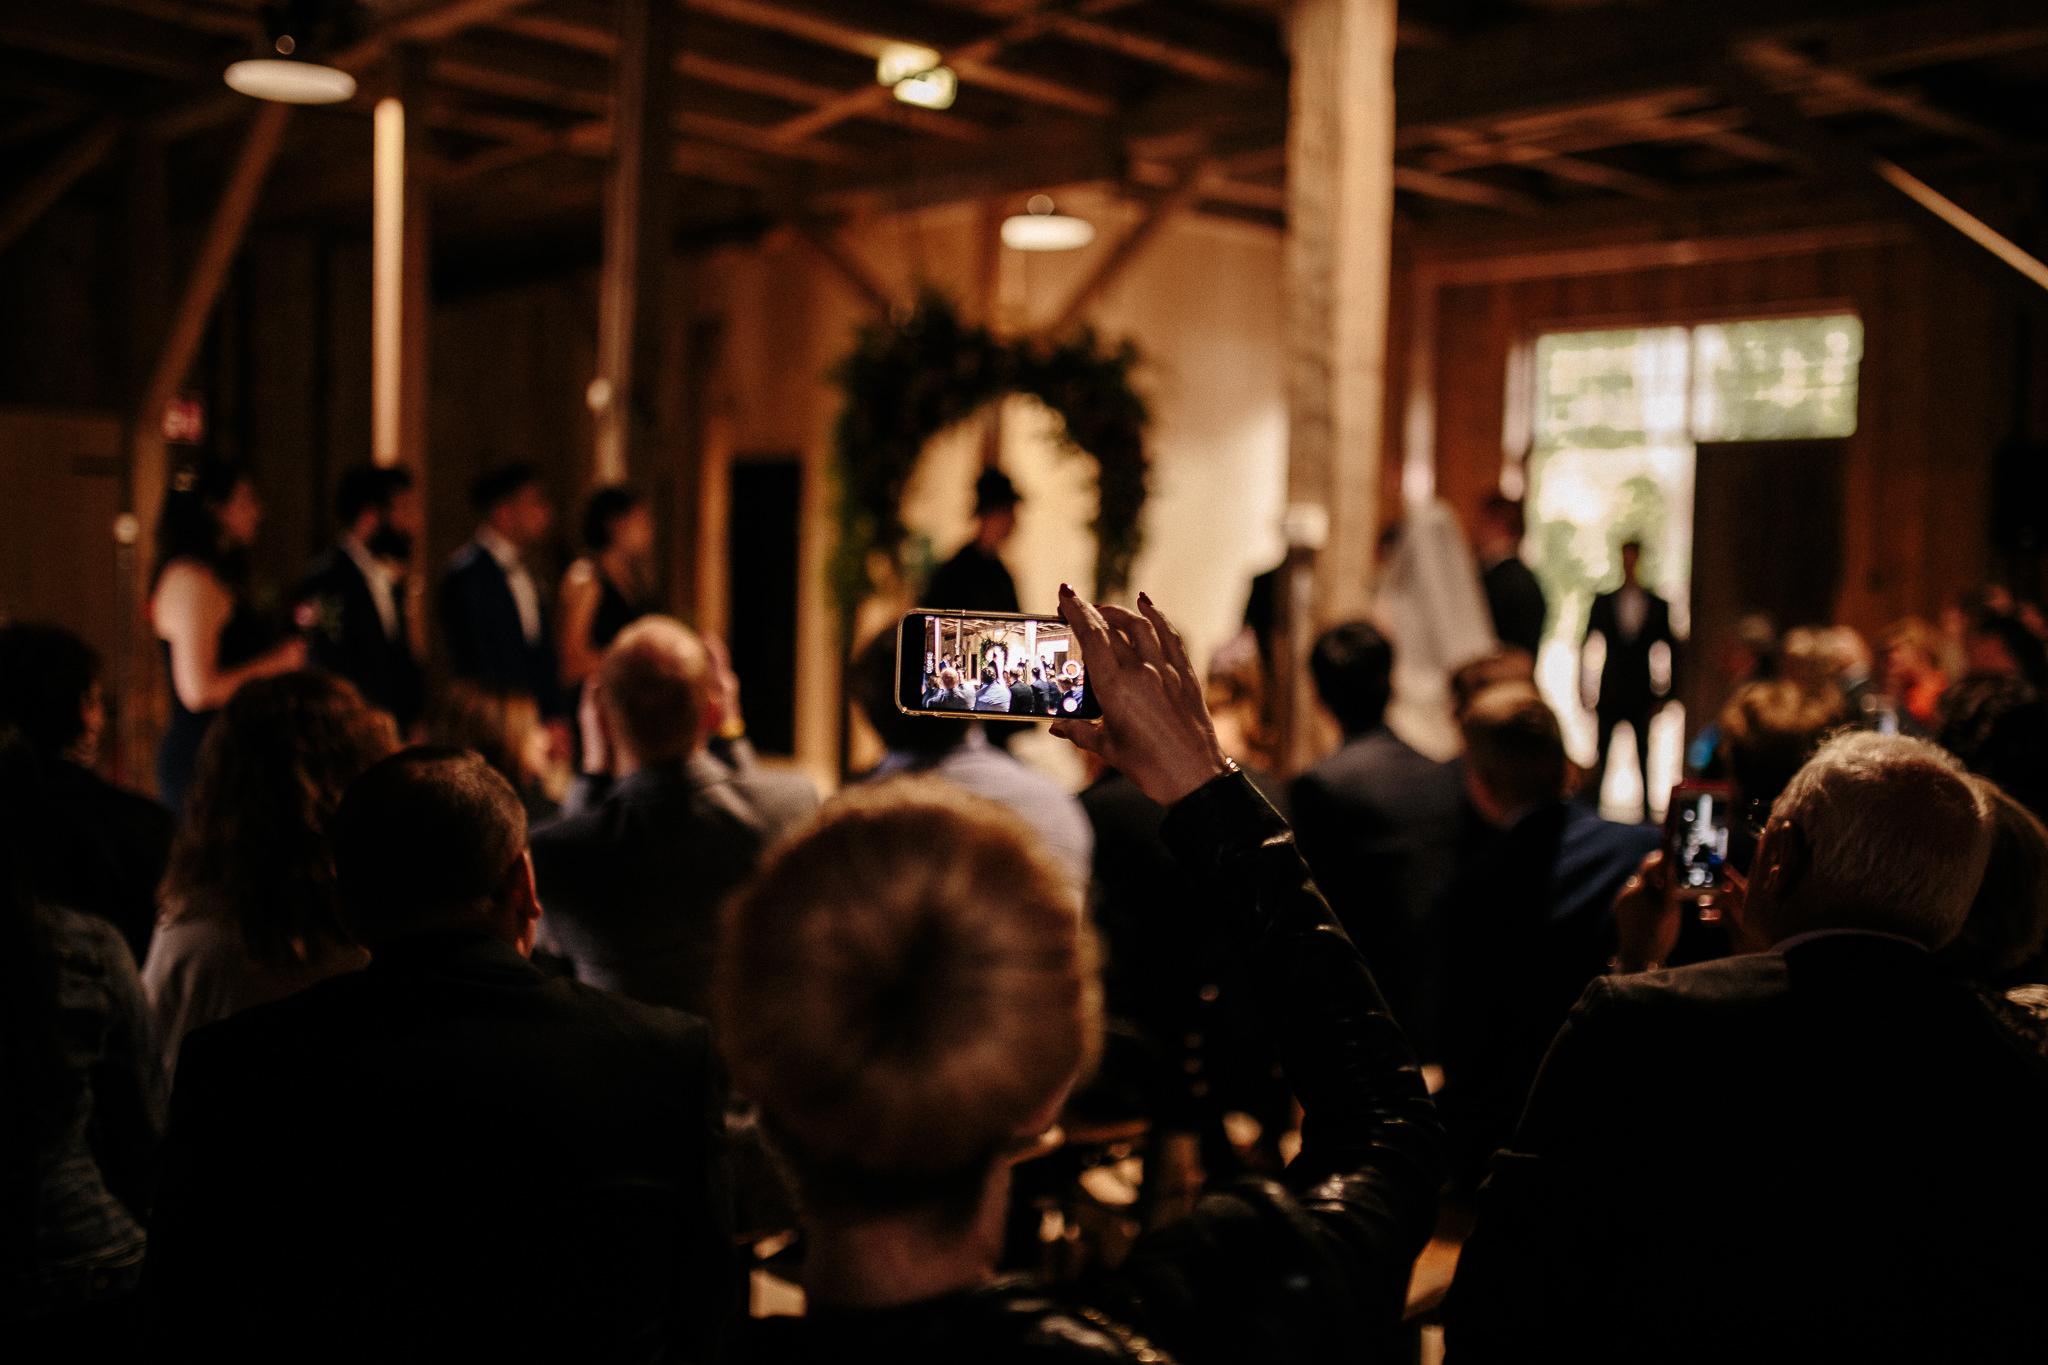 Ceren & Jani - Finland Wedding Photographer - Weddings by Qay - Wedding Photographer (97 of 166).jpg